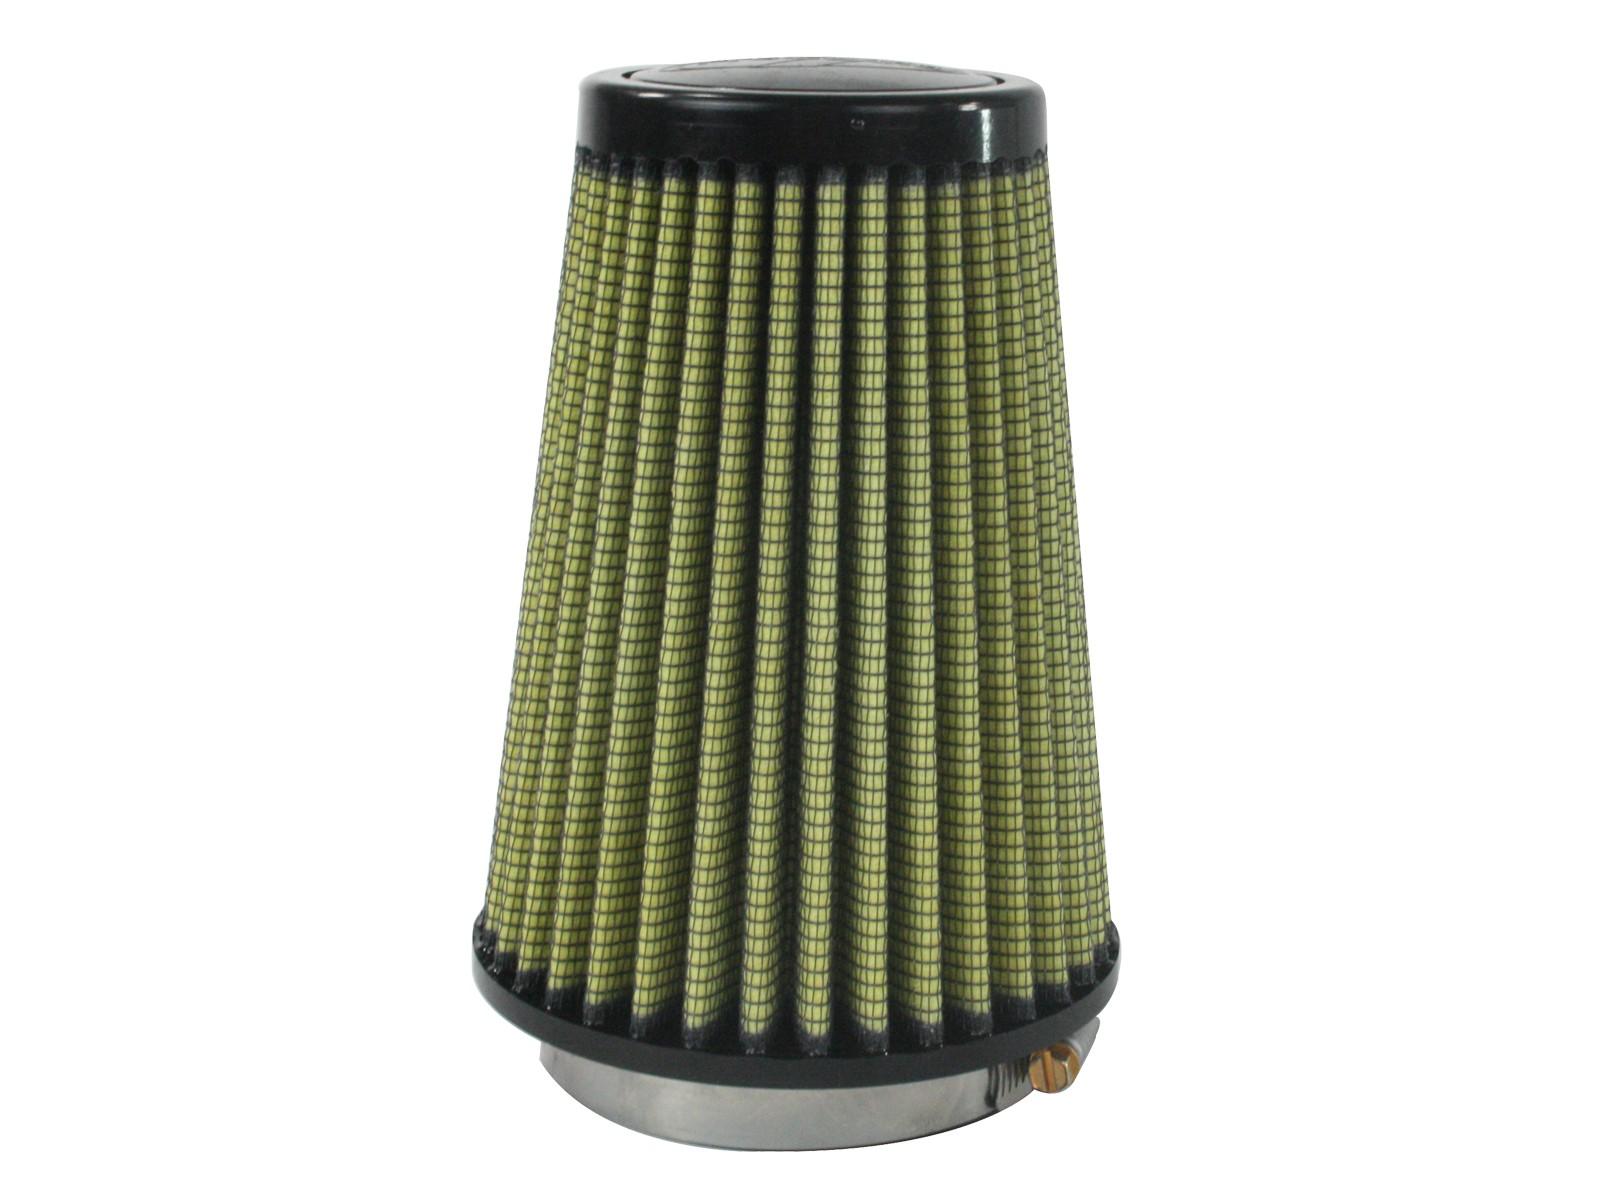 aFe POWER 72-35507 Magnum FLOW Pro GUARD7 Air Filter